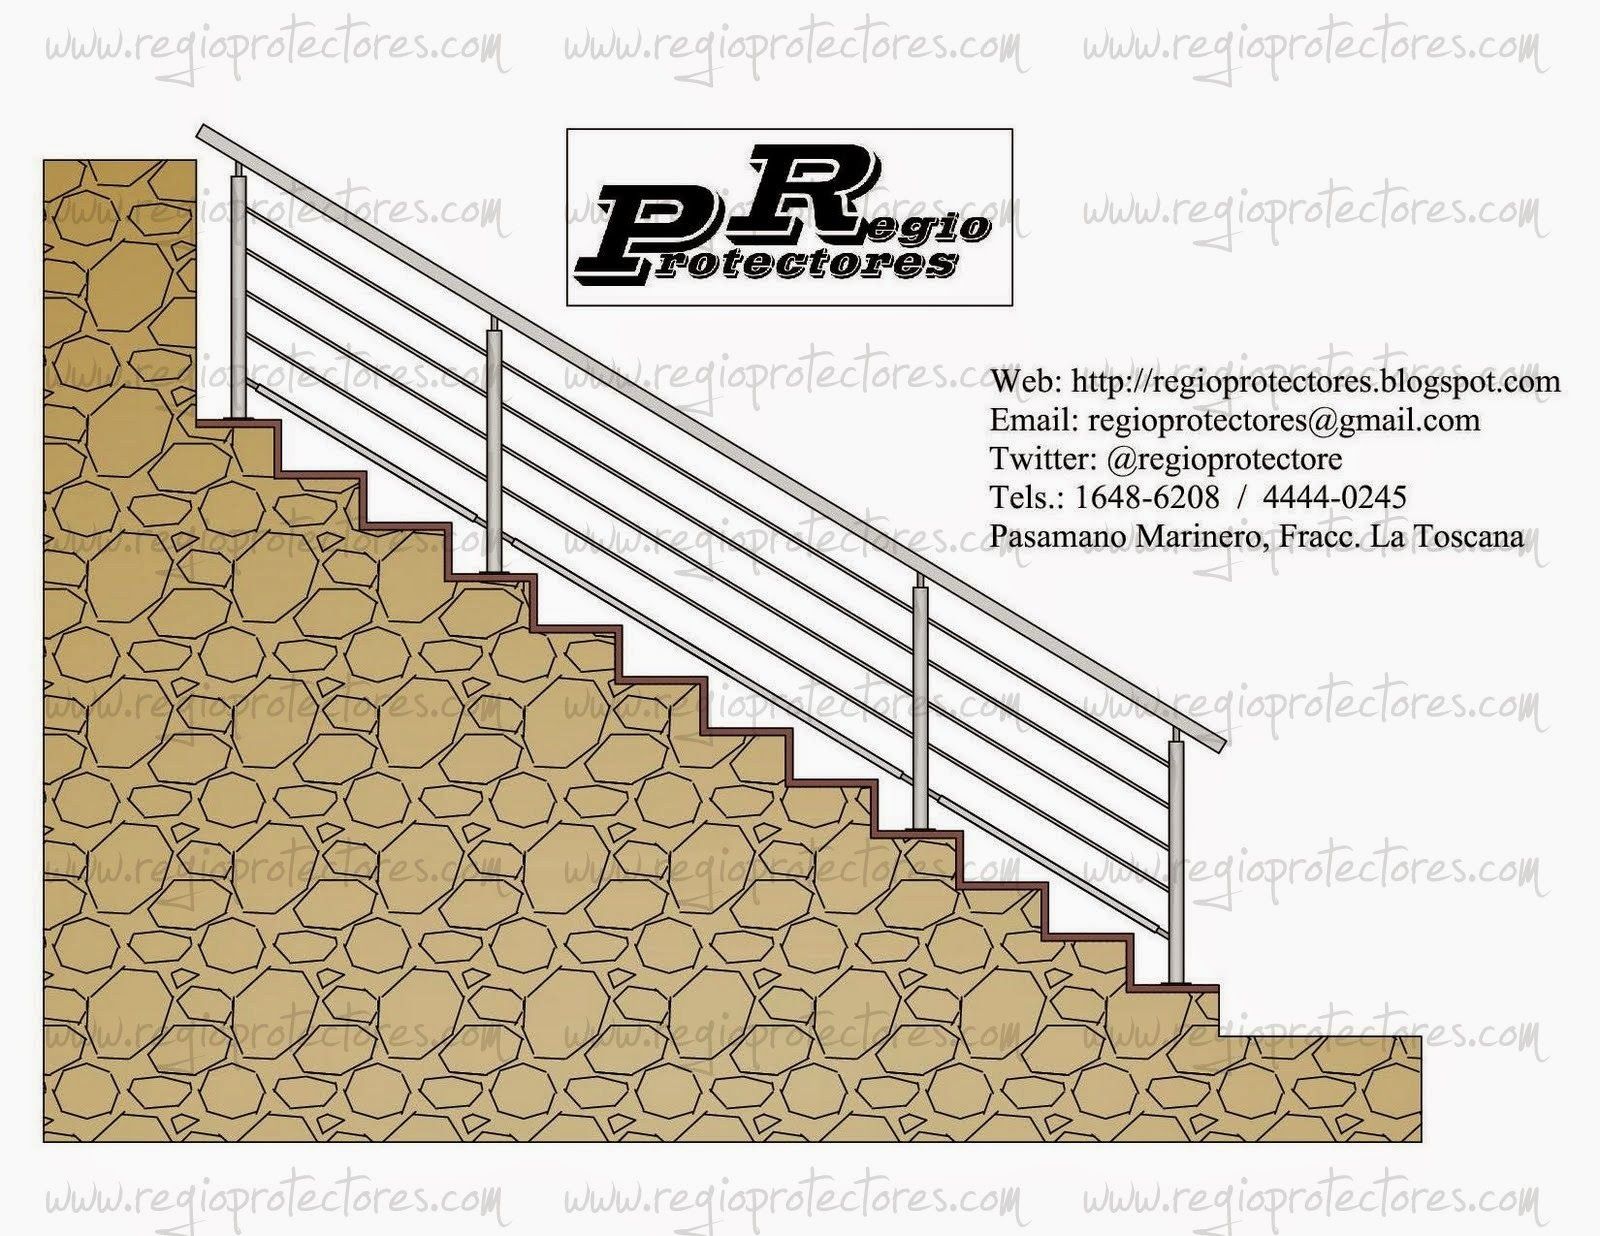 Regio protectores dise o de pasamano para escalera tipo for Escalera tipo u